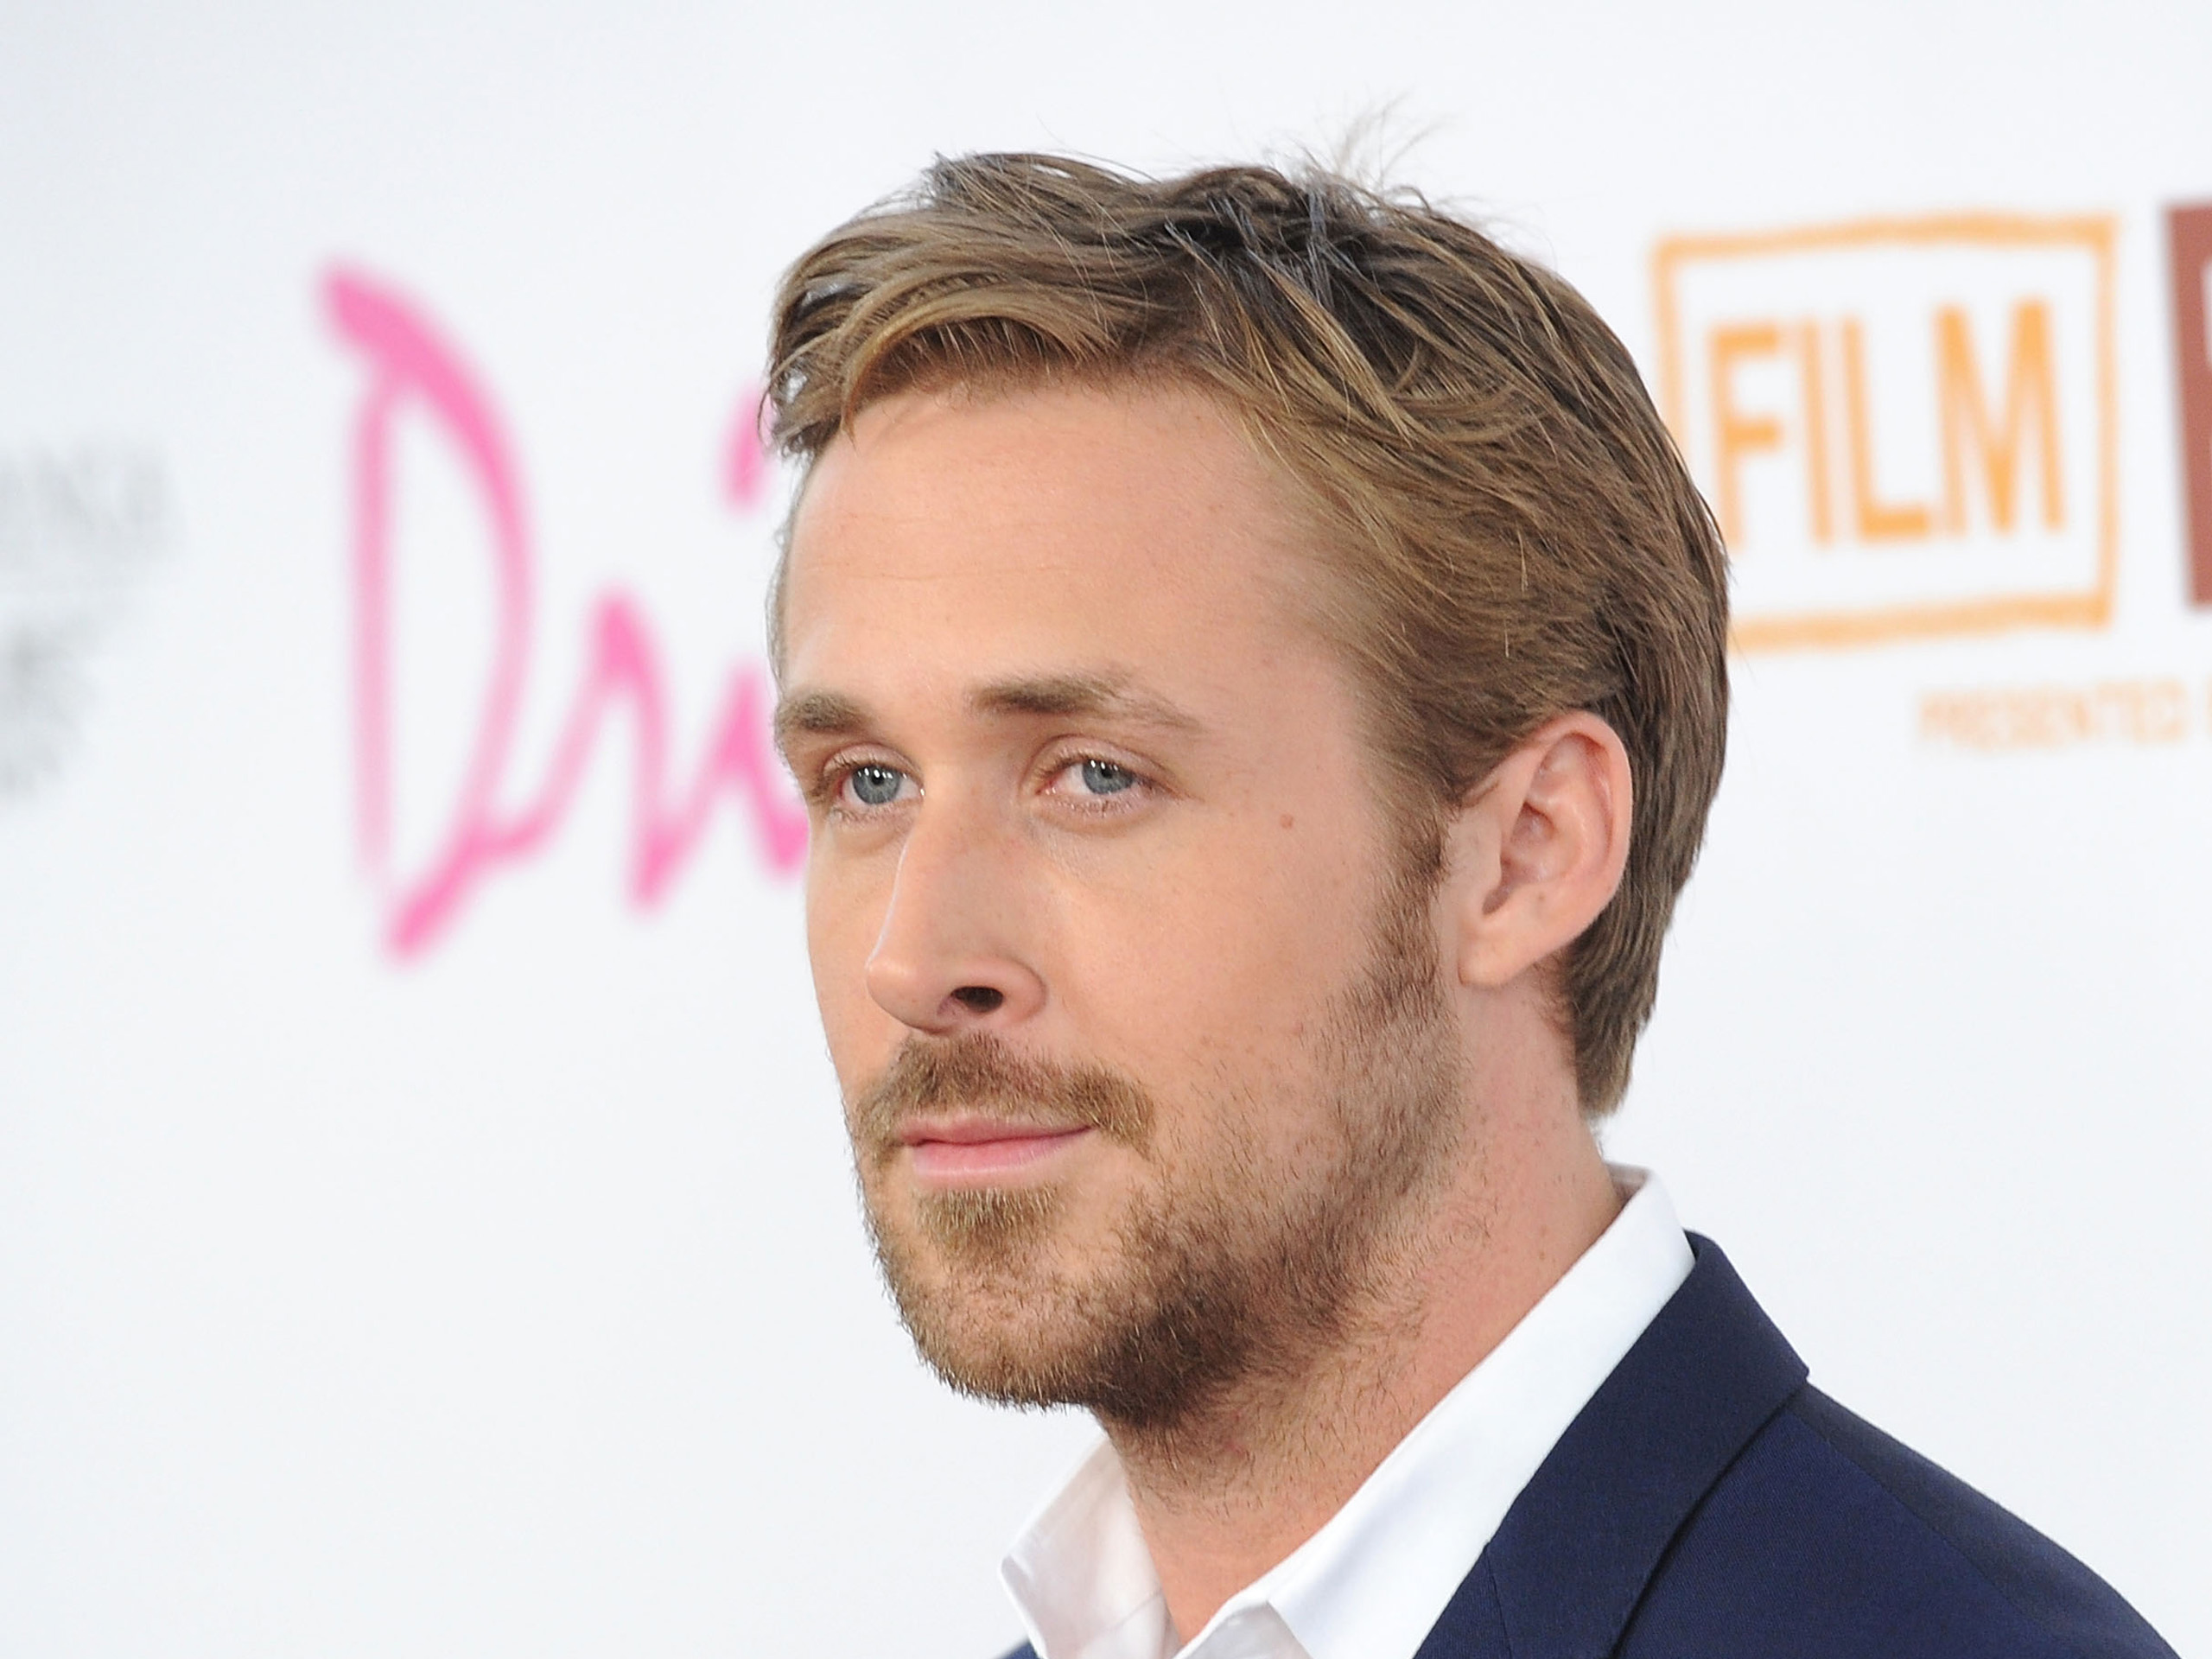 Ryan Gosling HD Wallpapers for desktop download 2560x1920